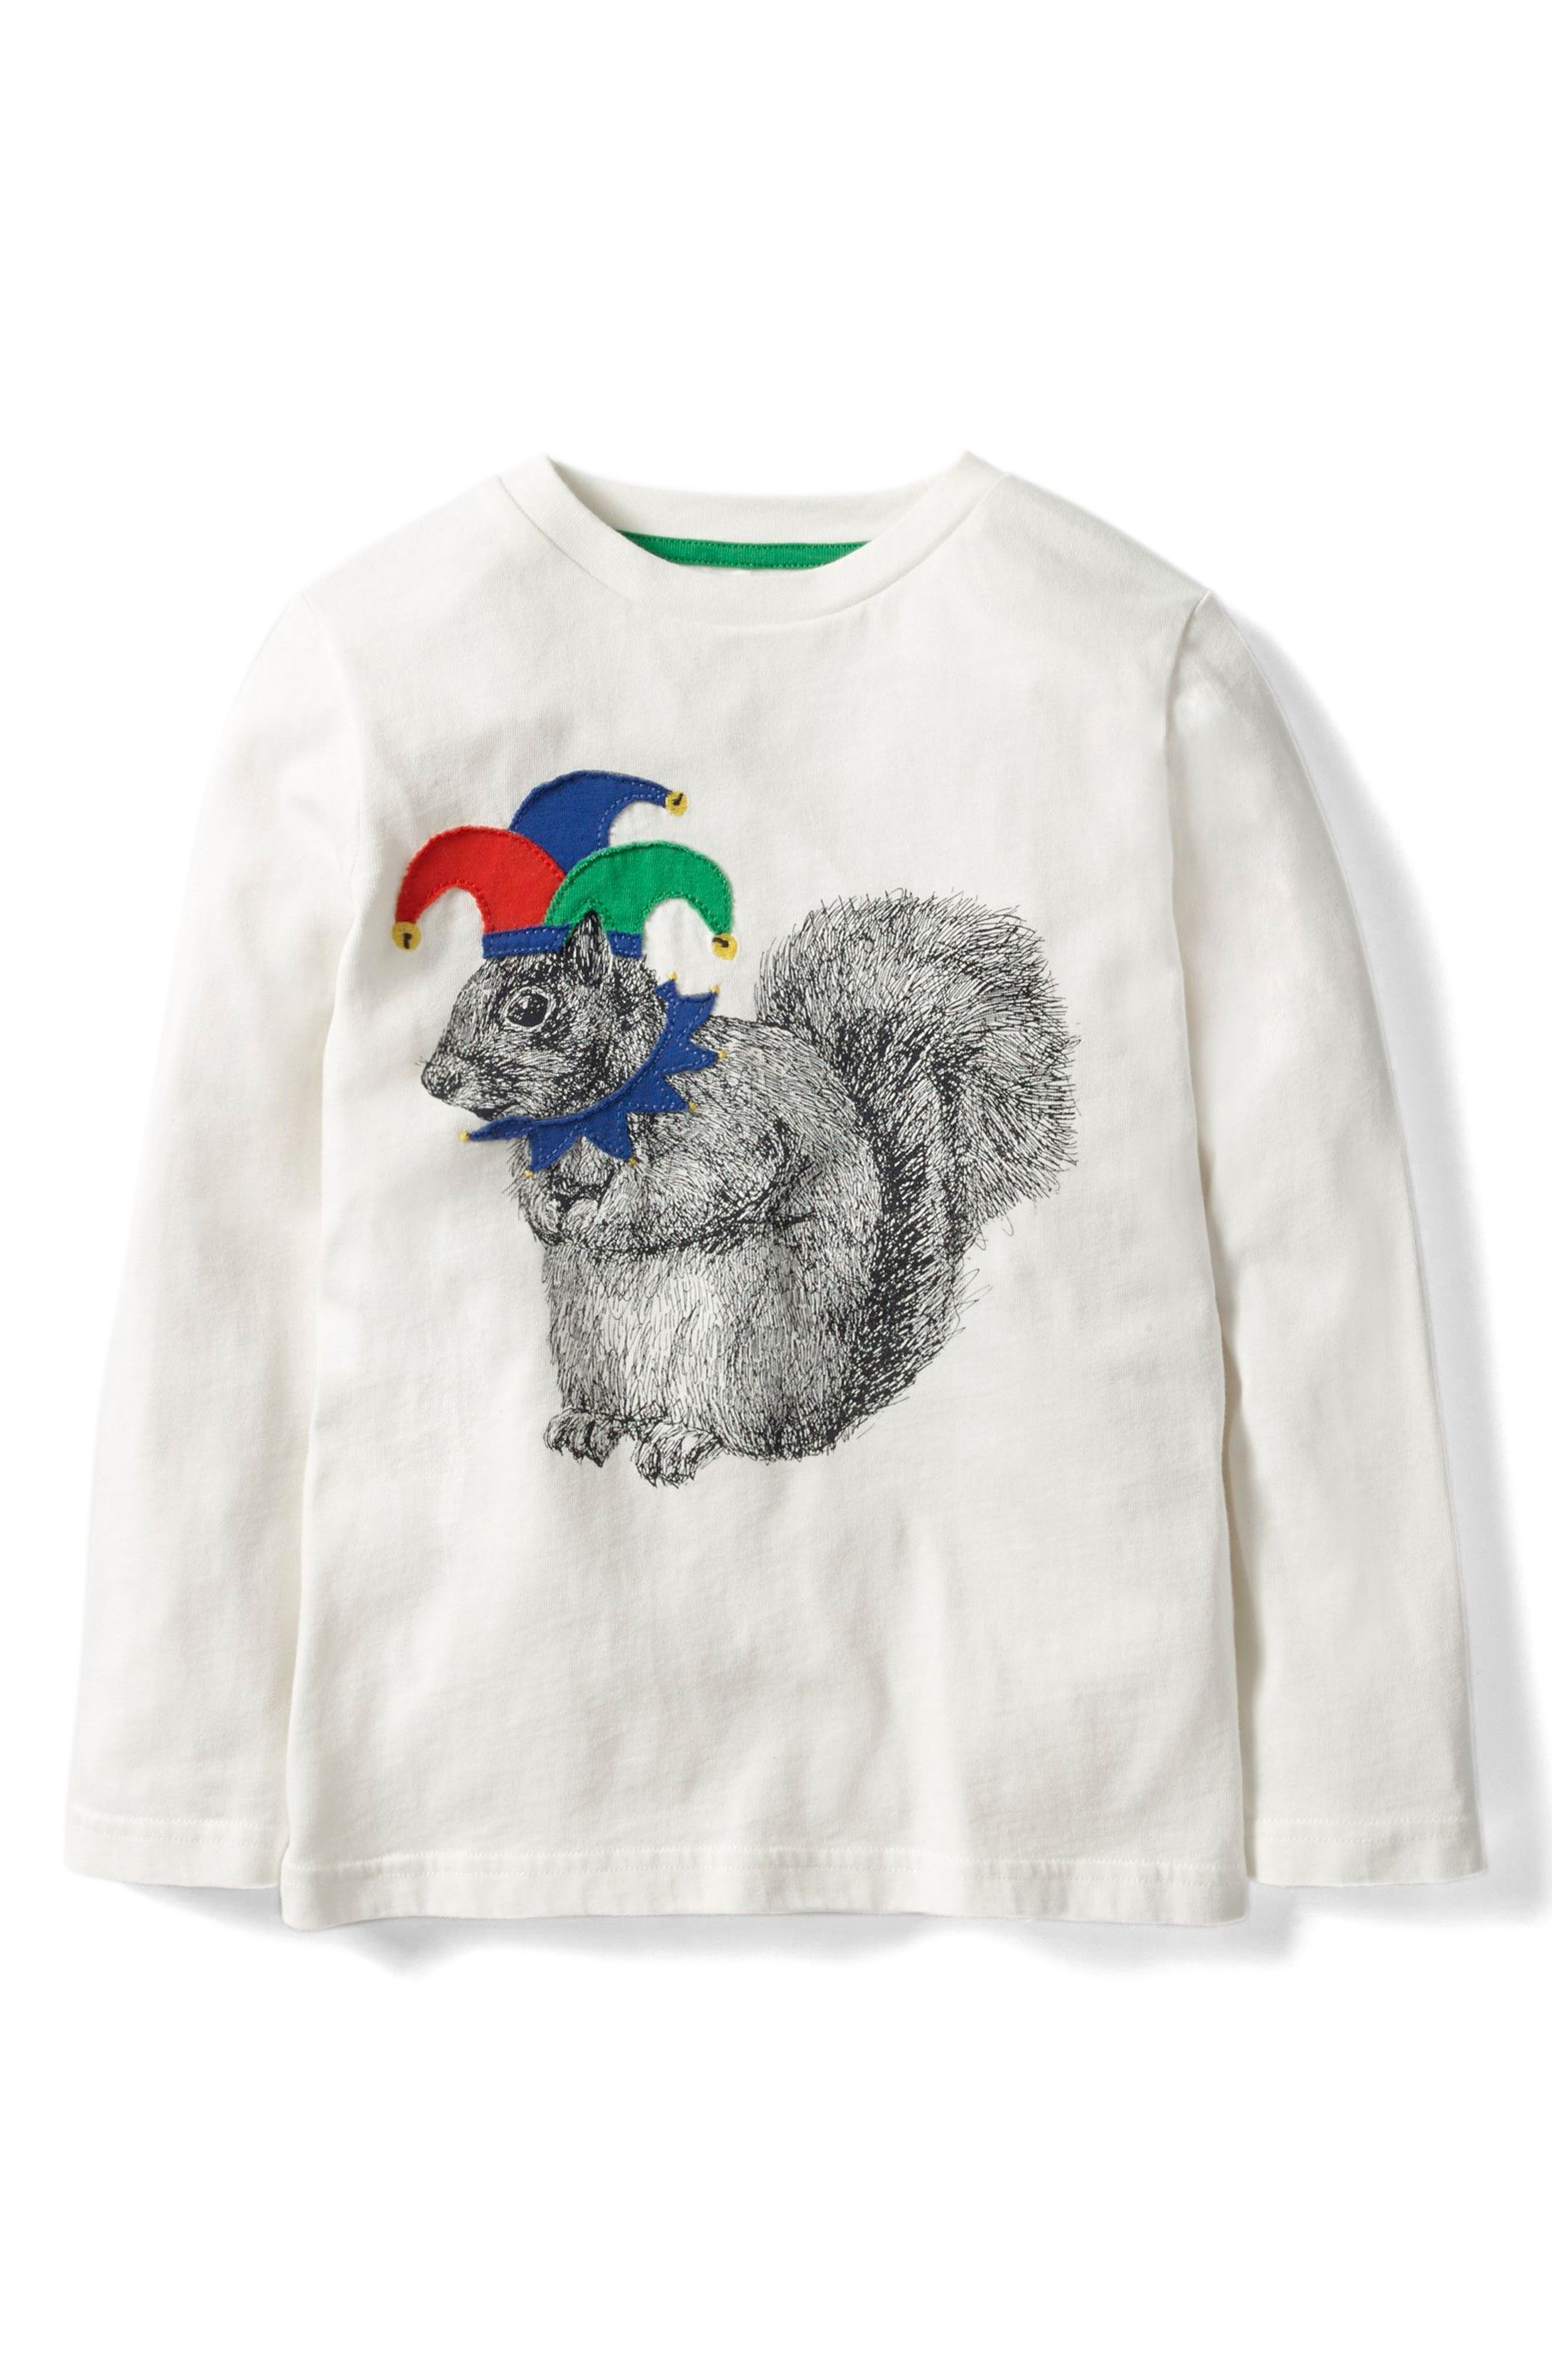 Animals Rule Long Sleeve T-Shirt,                             Main thumbnail 1, color,                             904